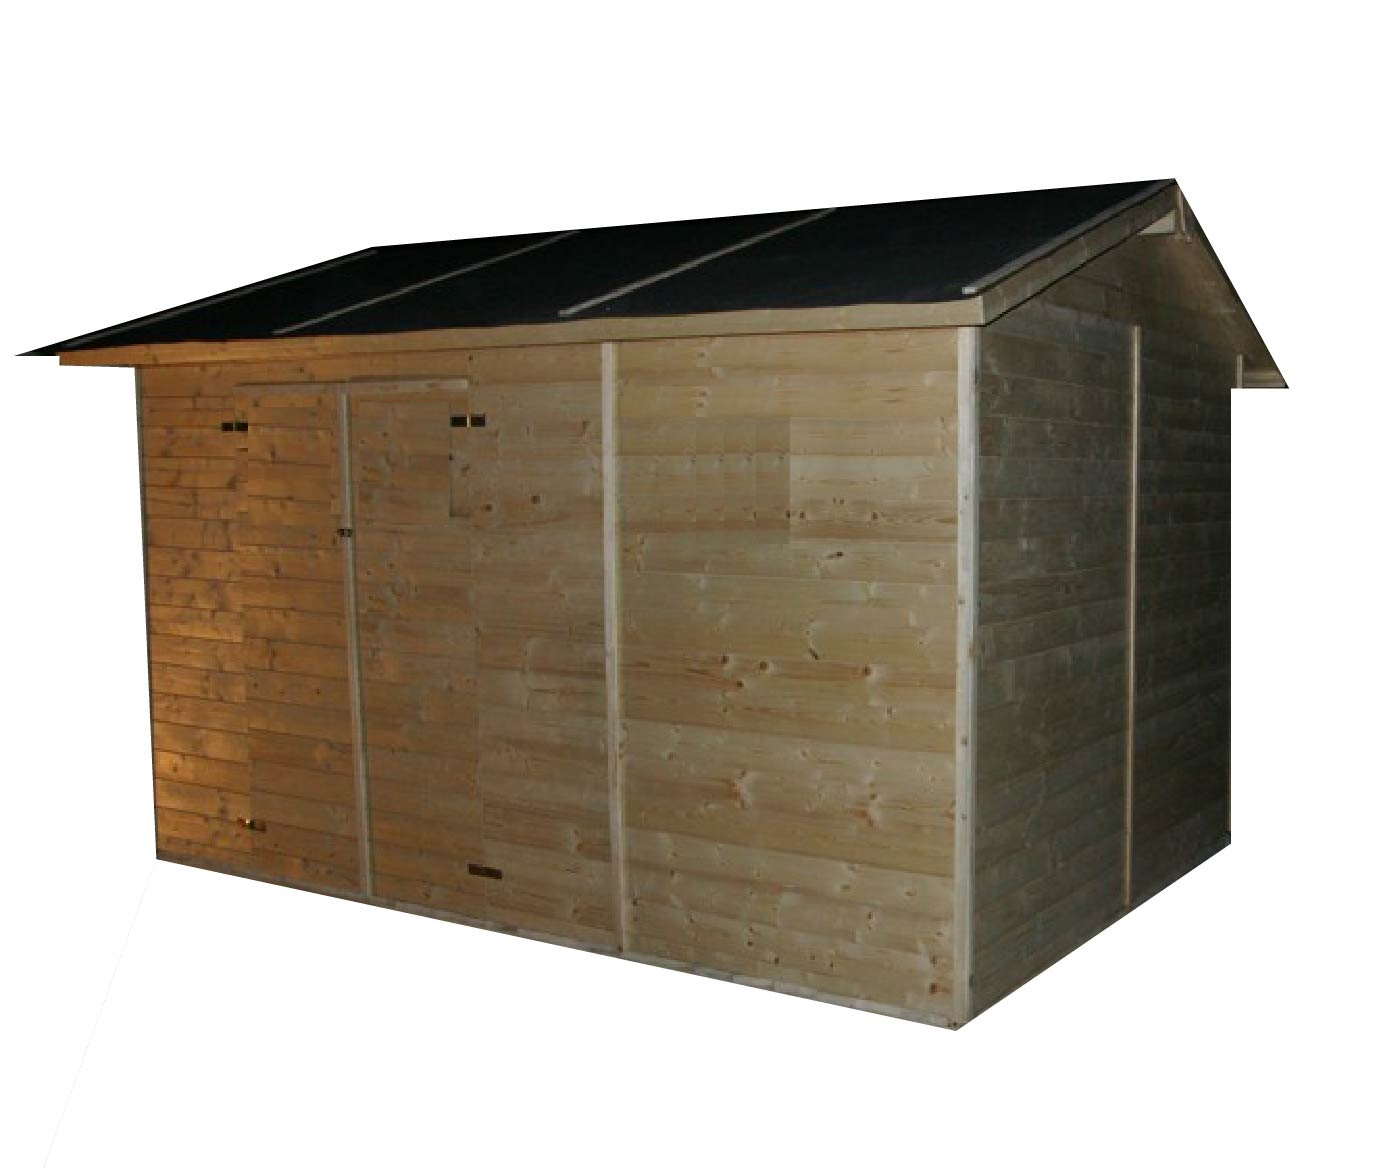 gartenh user bis 12 m2 gartenhaus aus holz 3 3m x 3 9m. Black Bedroom Furniture Sets. Home Design Ideas